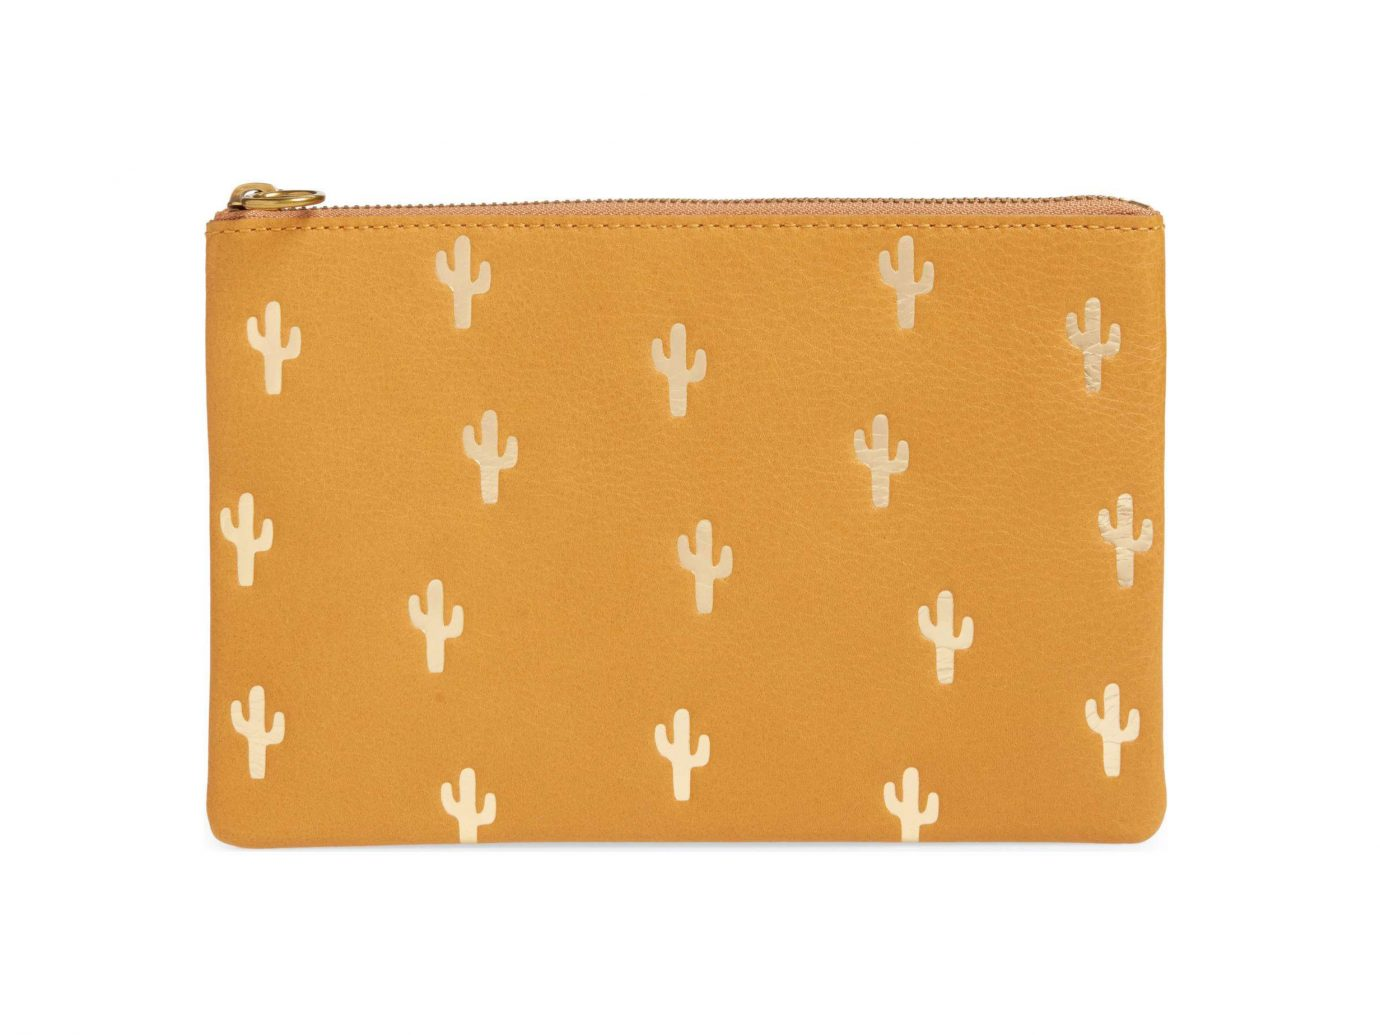 City Palm Springs Style + Design Travel Shop orange coin purse wristlet wallet pattern rectangle